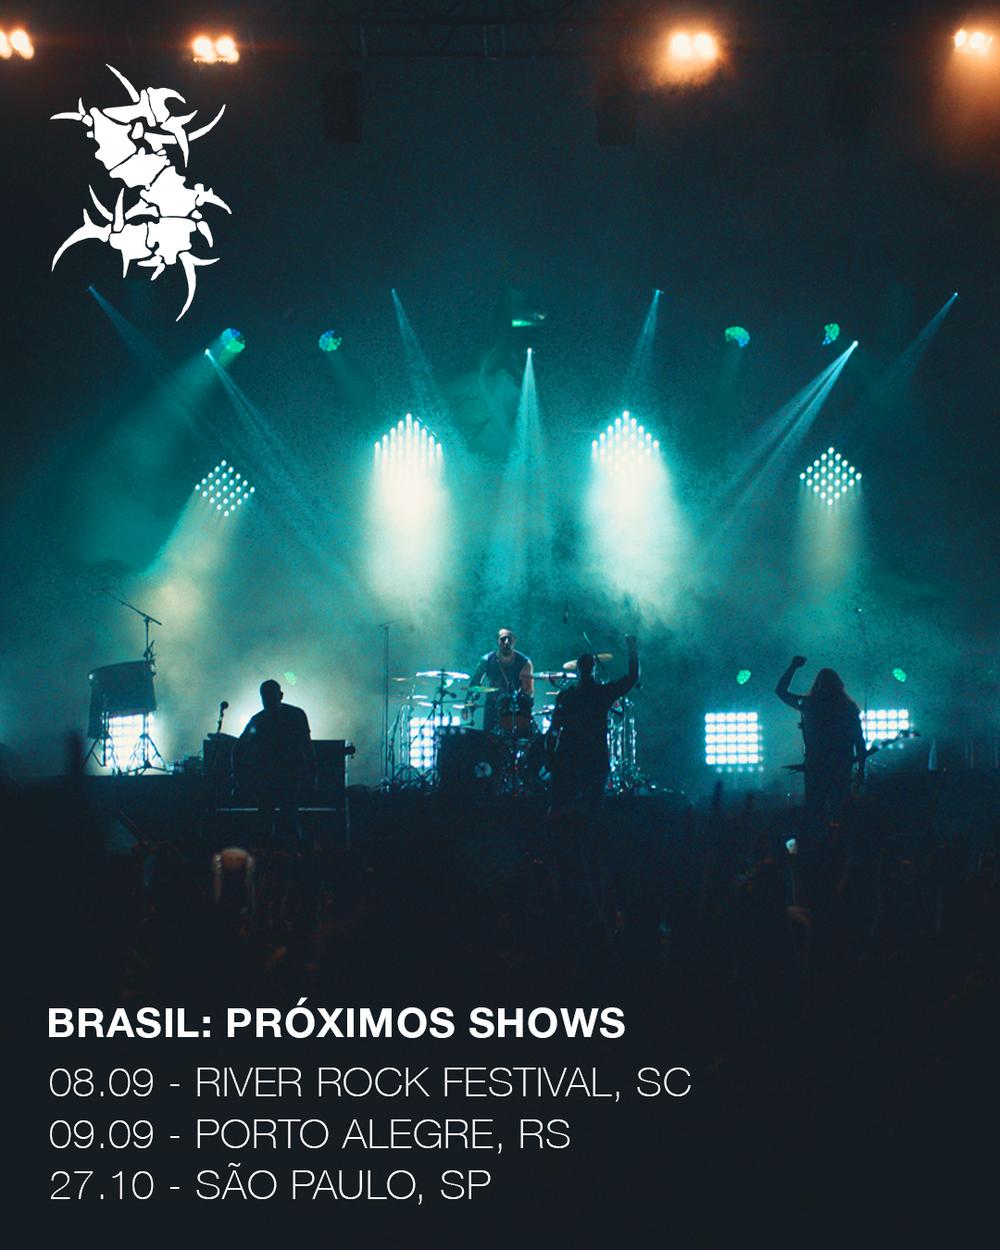 Brasil: Próximos shows